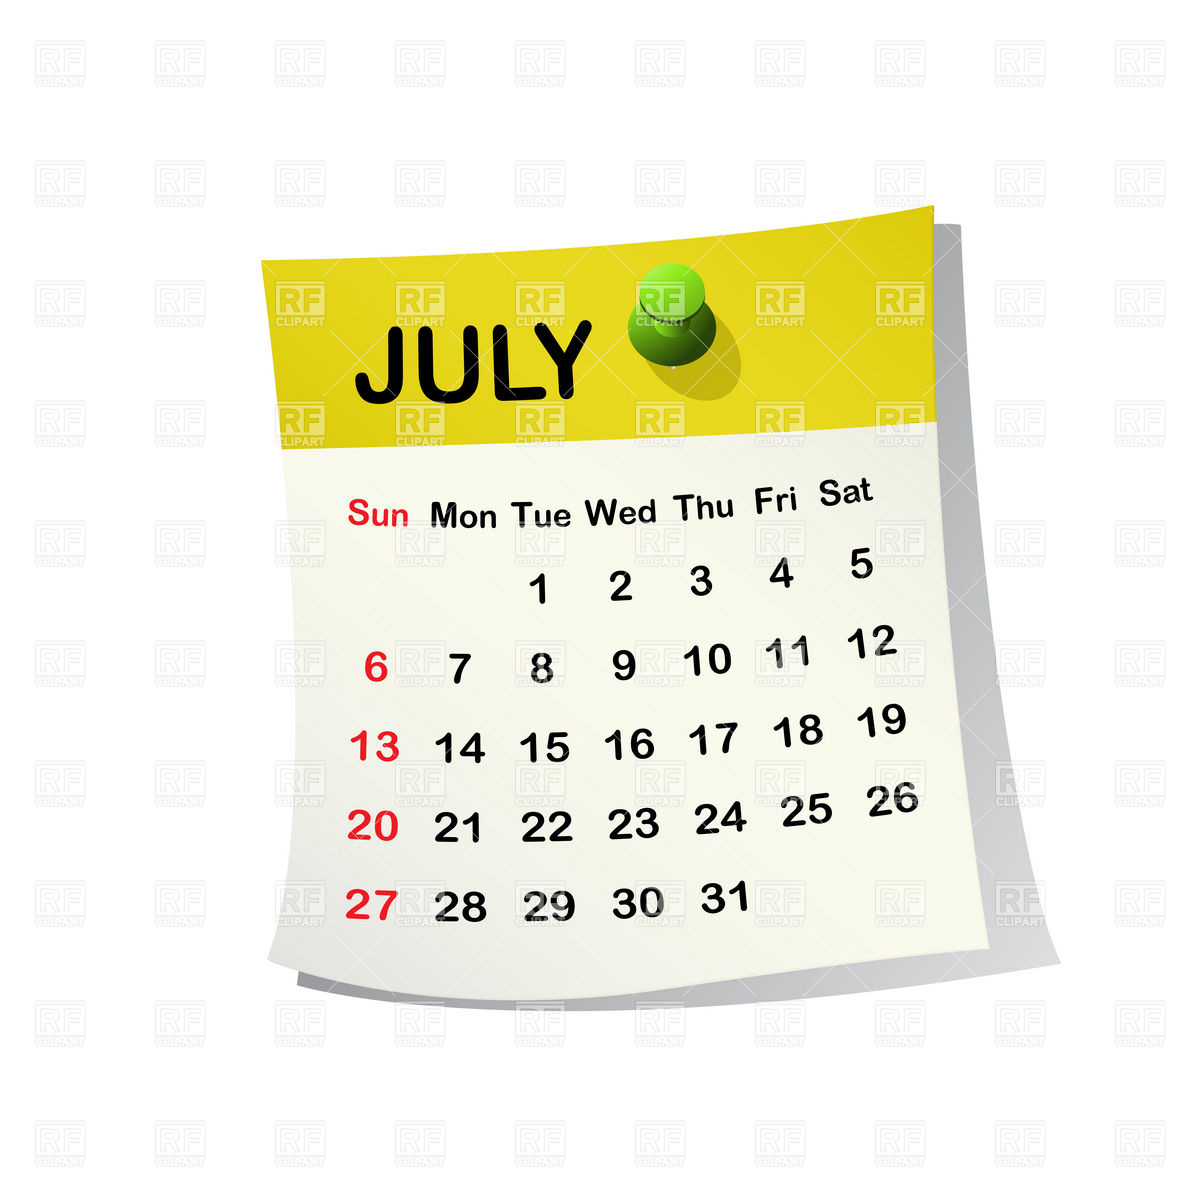 Calendar clipart july clip freeuse download July Calendar Clipart - Clipart Kid clip freeuse download